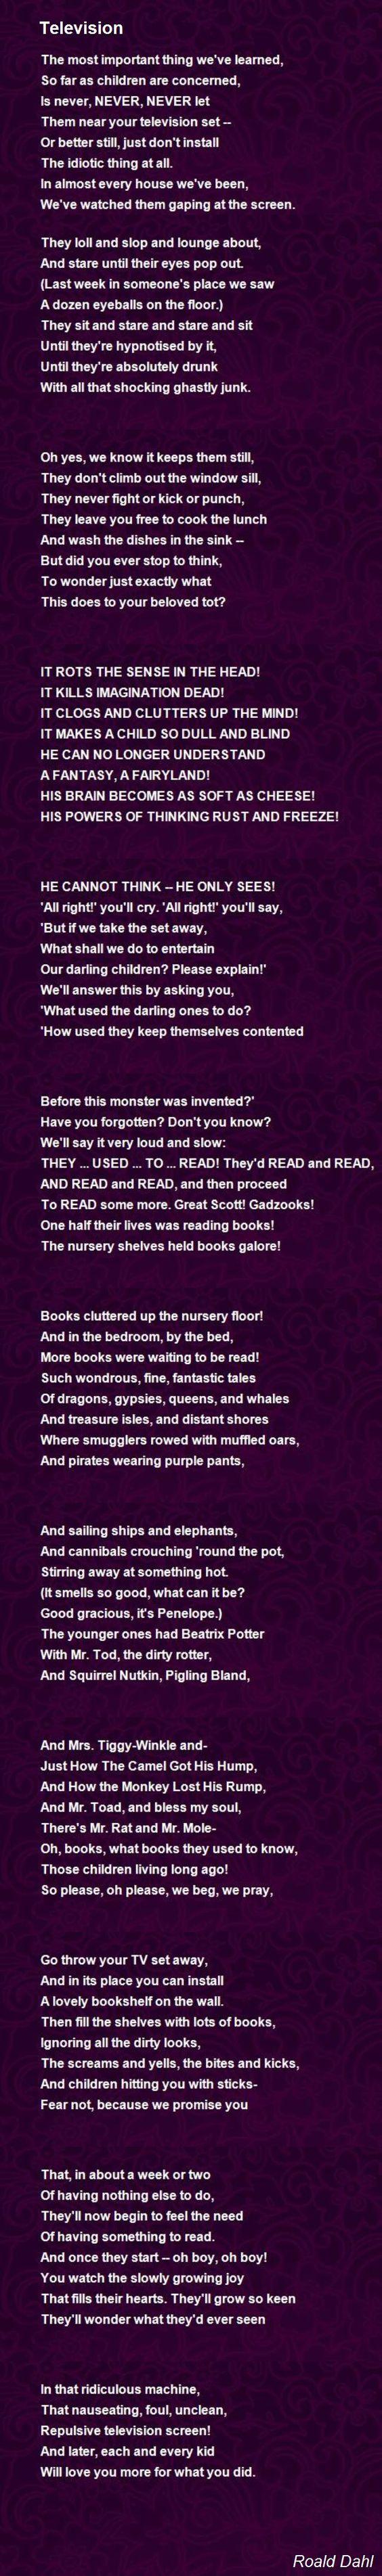 Get rid of the TV! (Roald Dahl) complete version